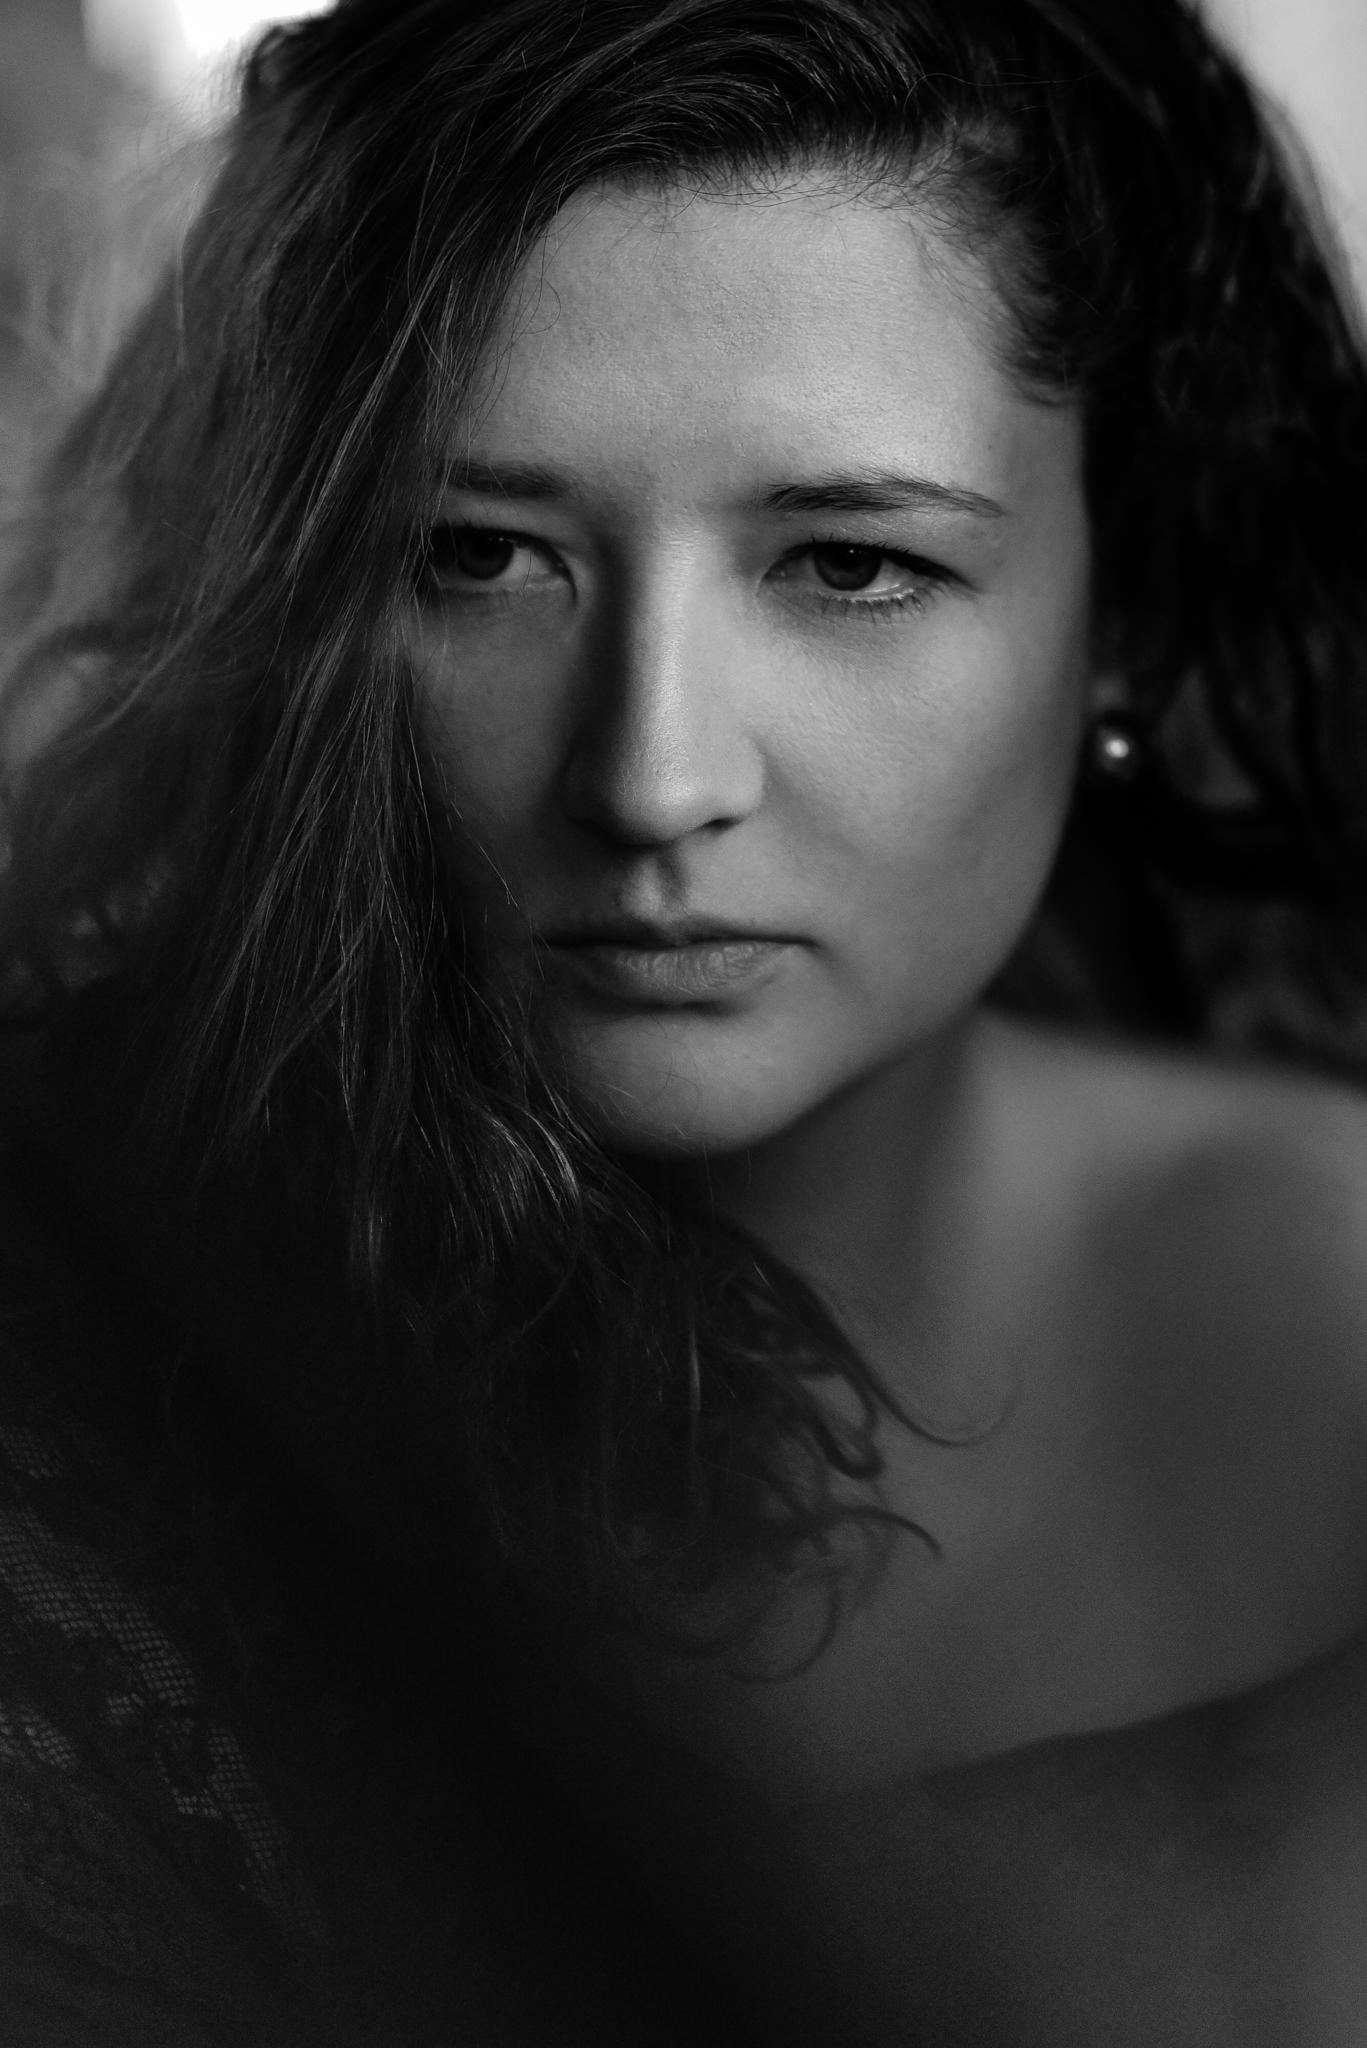 Fotograf   Lena Busch - Deichlicht Photography